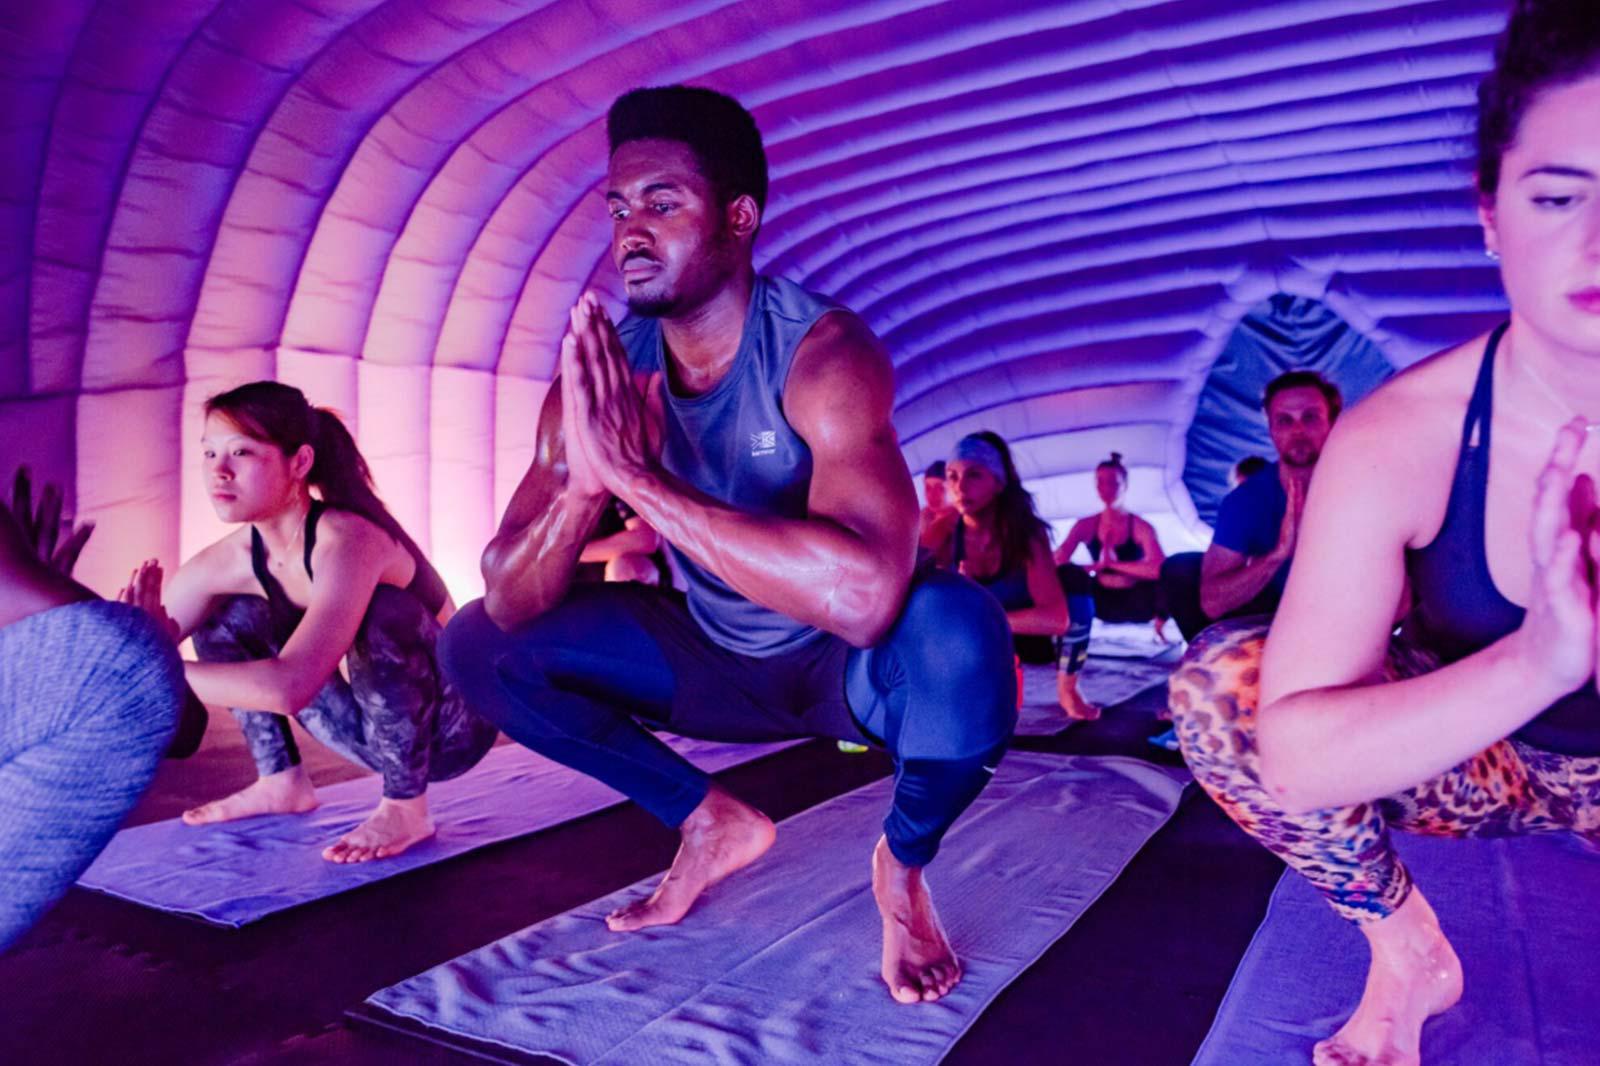 Hotpod yoga case study 2